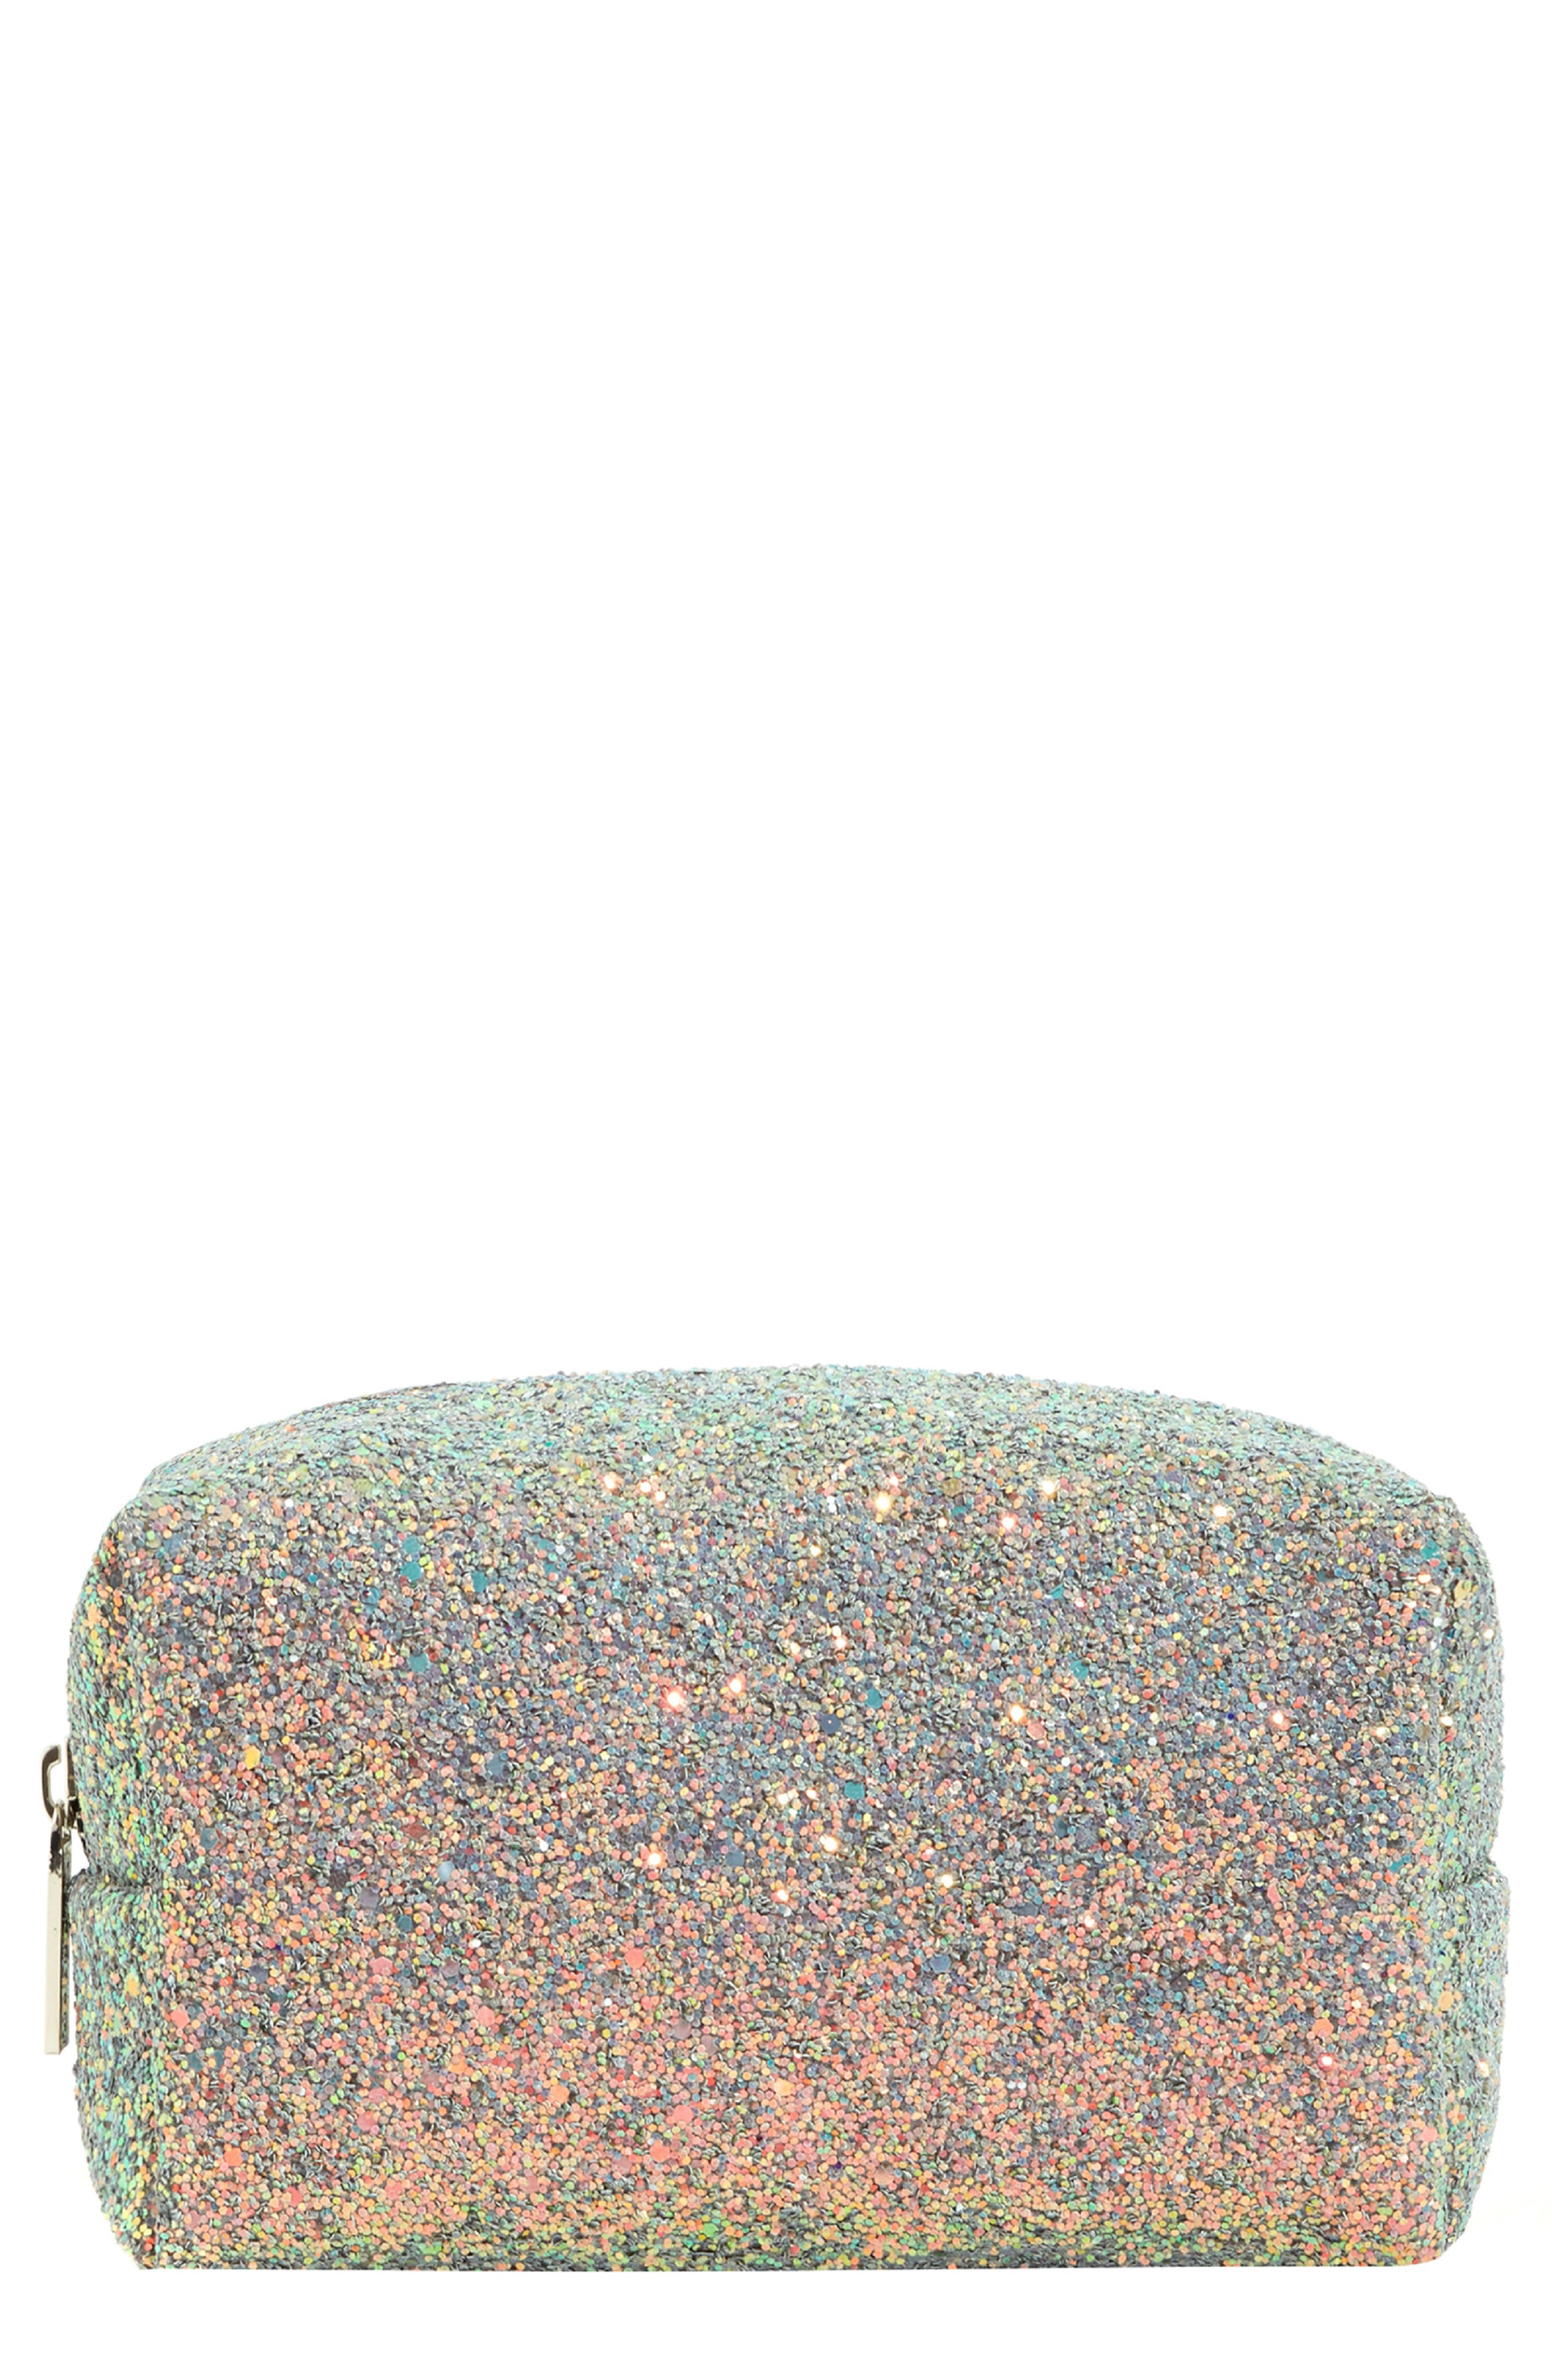 SkinnyDip Teal Glitter Makeup Bag